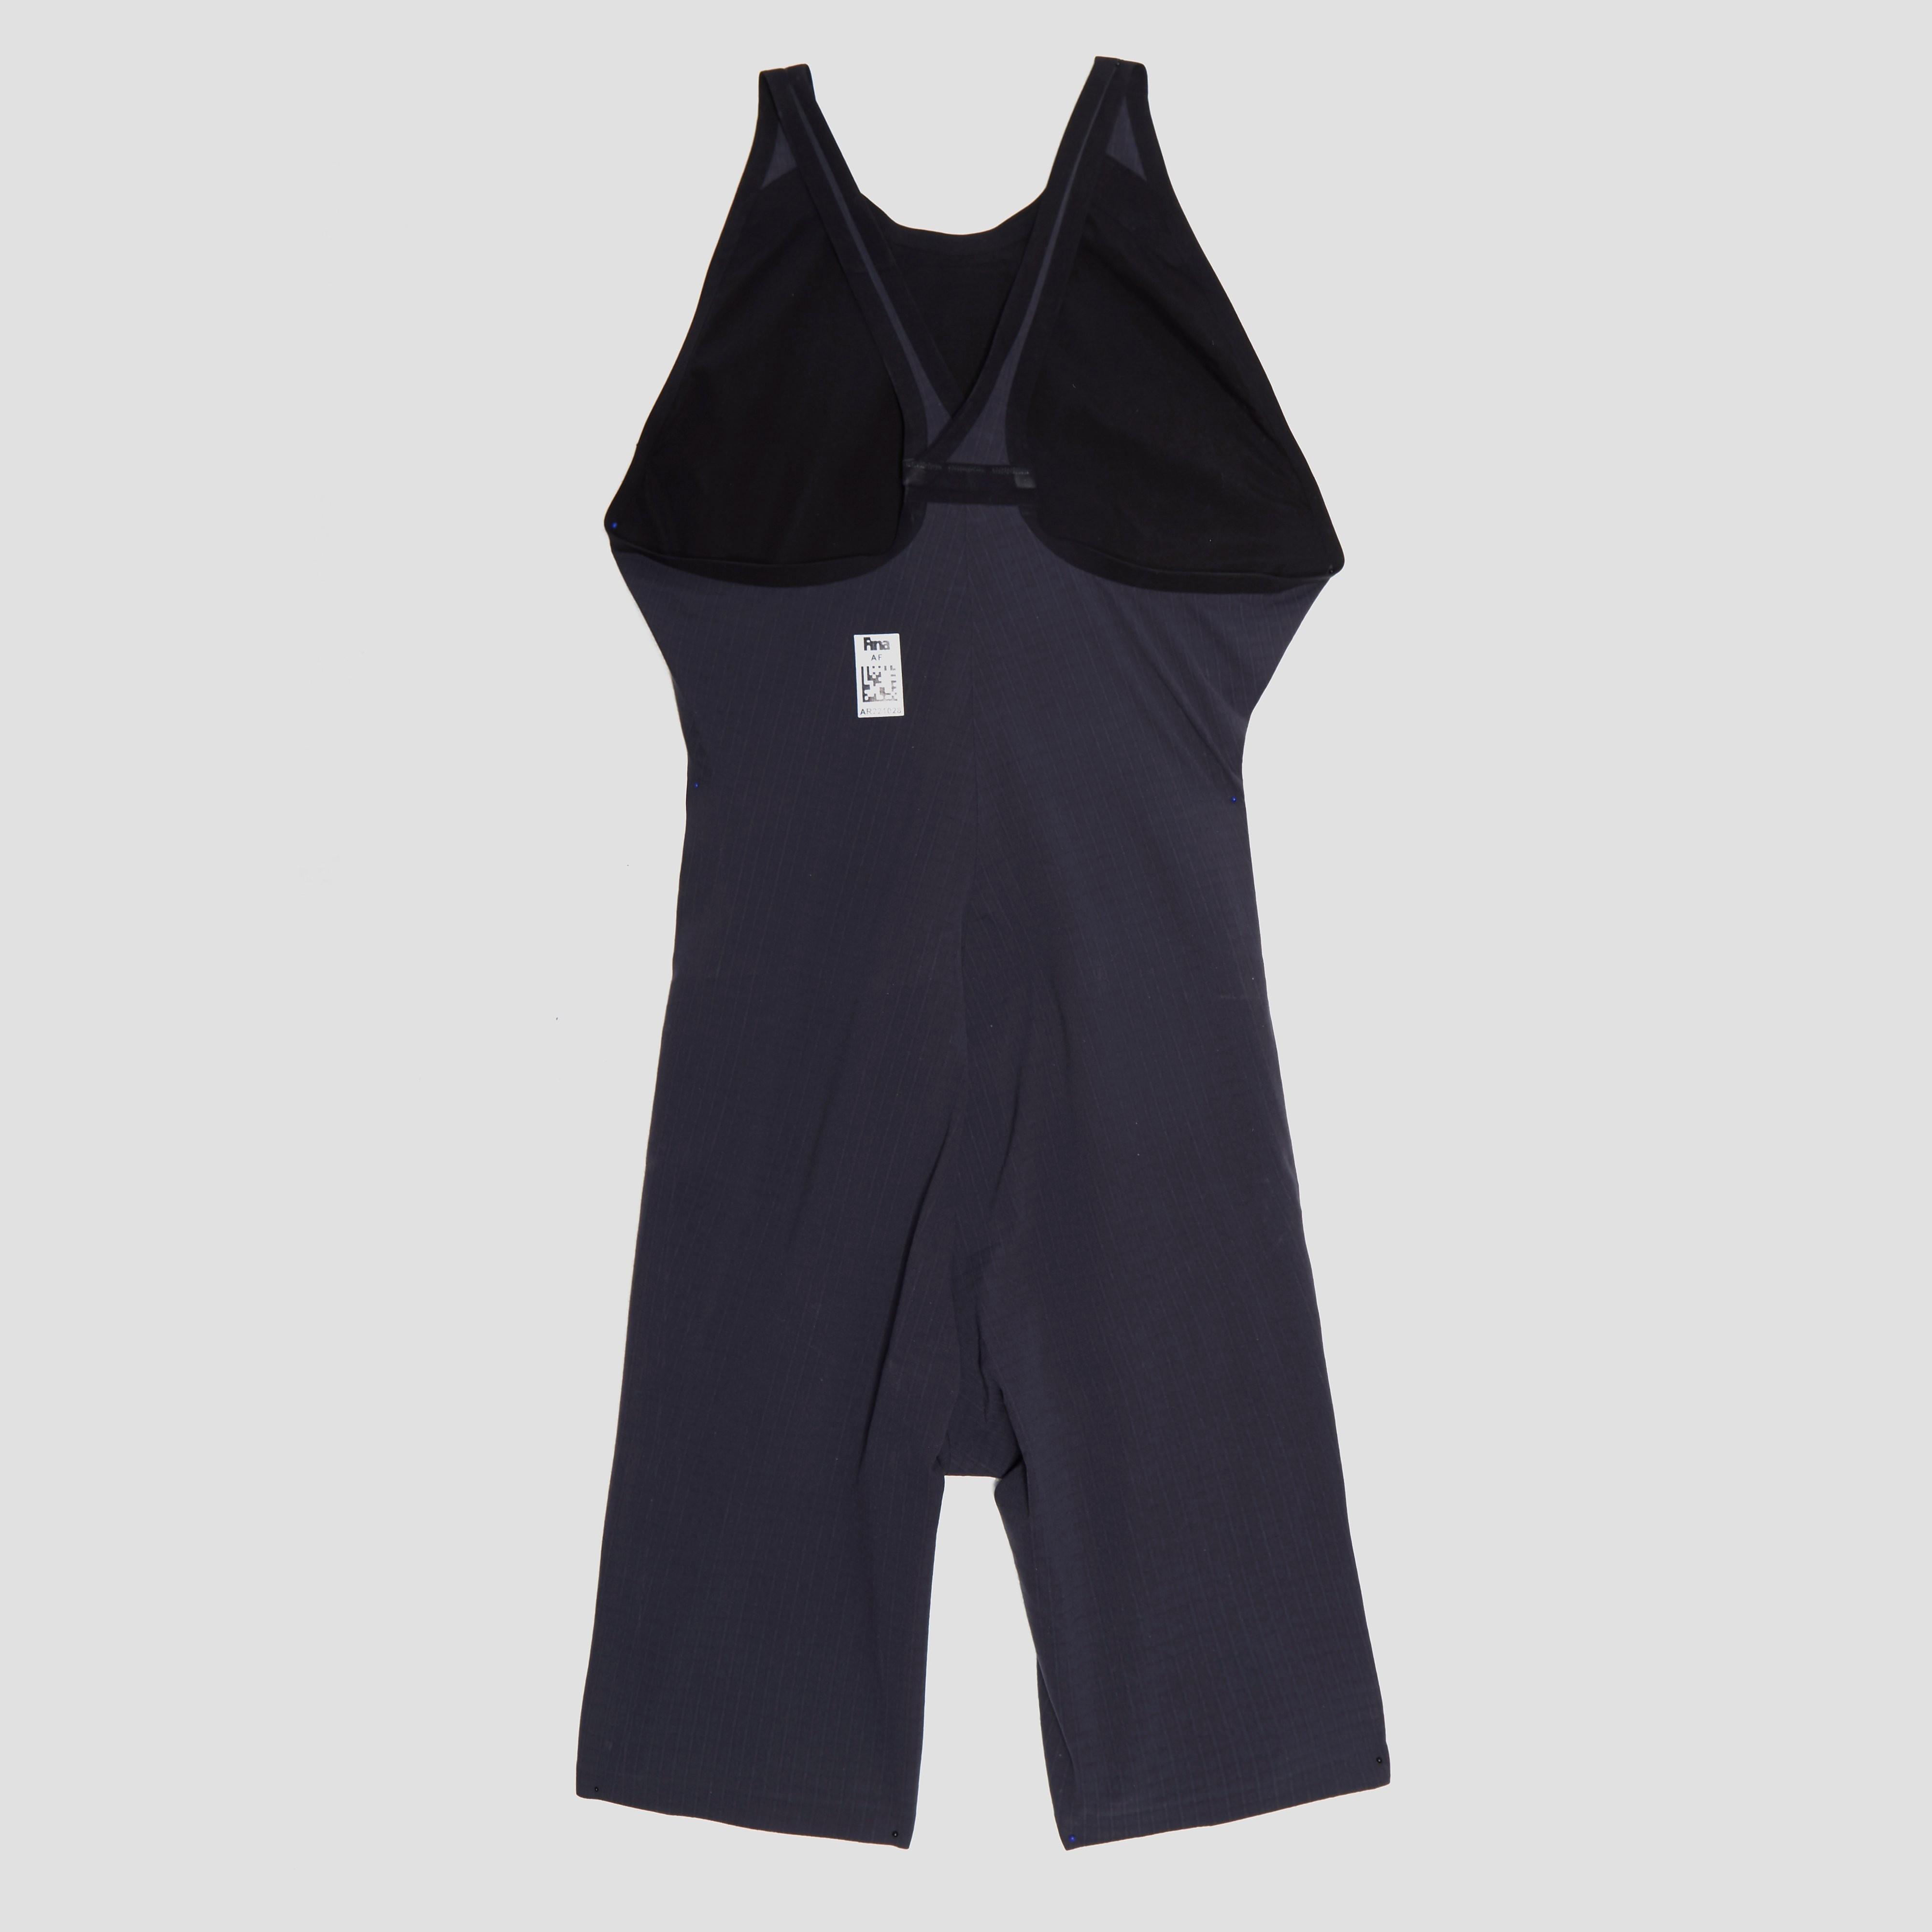 Arena Carbon Pro Powerskin Open Back Women's Swimsuit